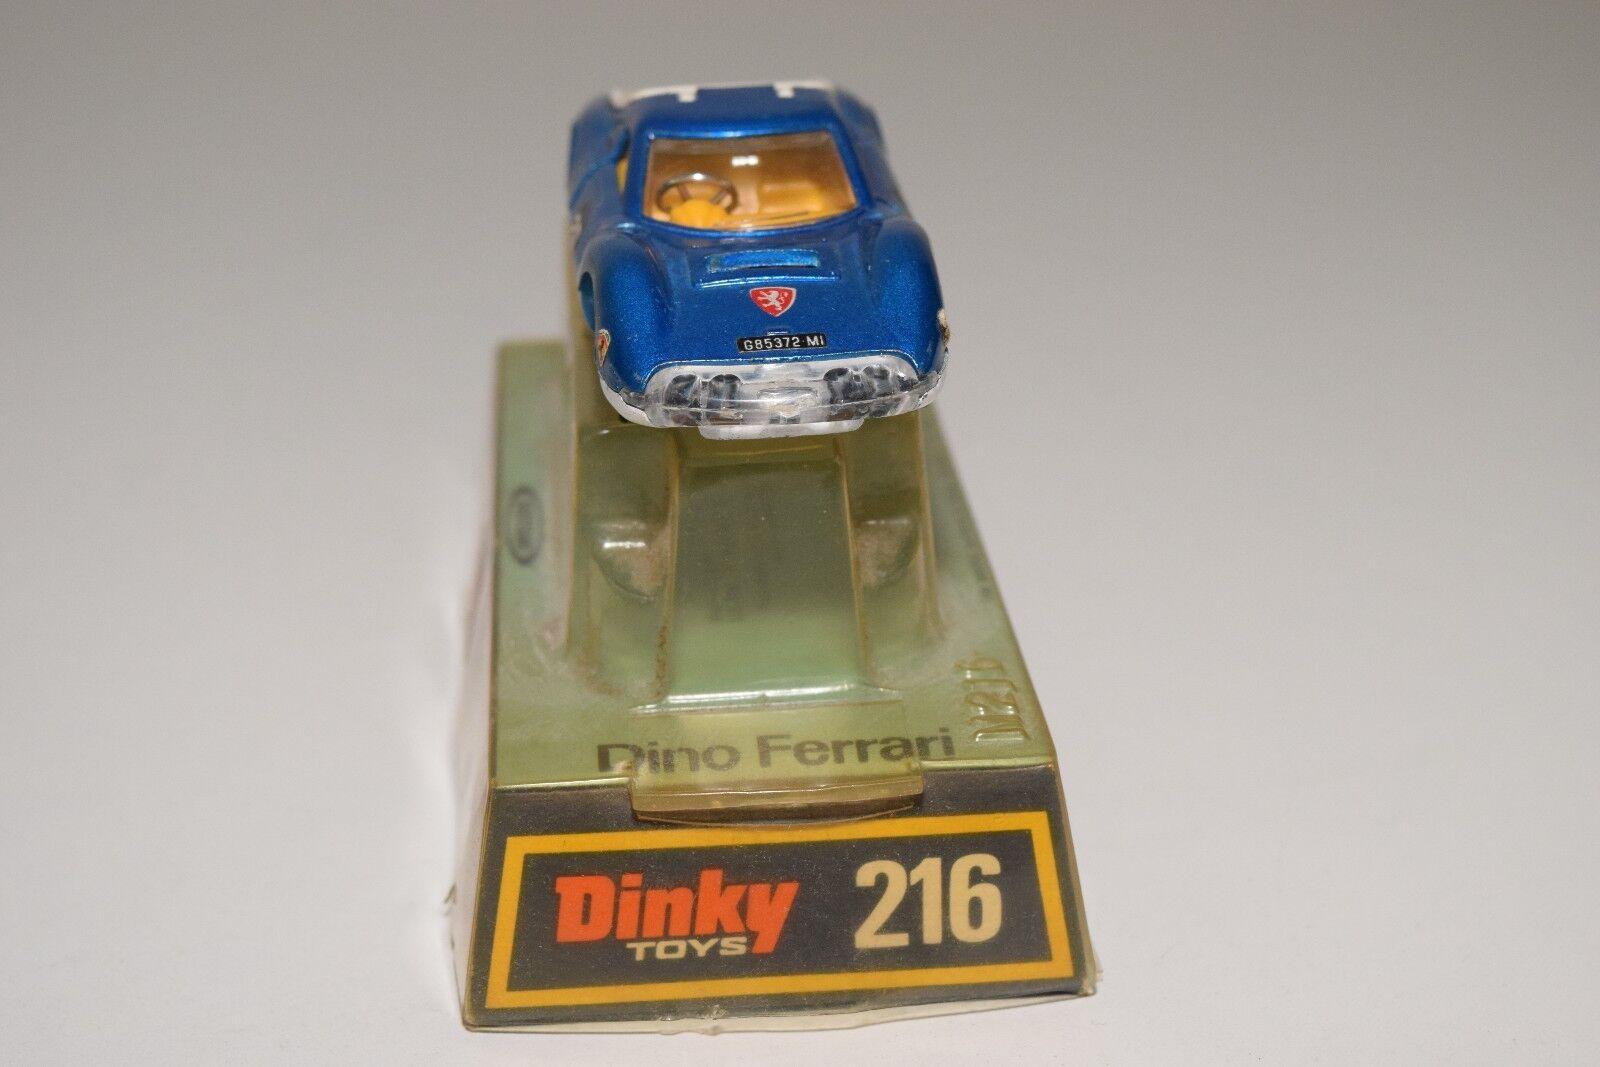 DINKY TOYS 216 FERRARI DINO METALLIC blueE NEAR NEAR NEAR MINT BOXED RARE SELTEN RARO baa1f1